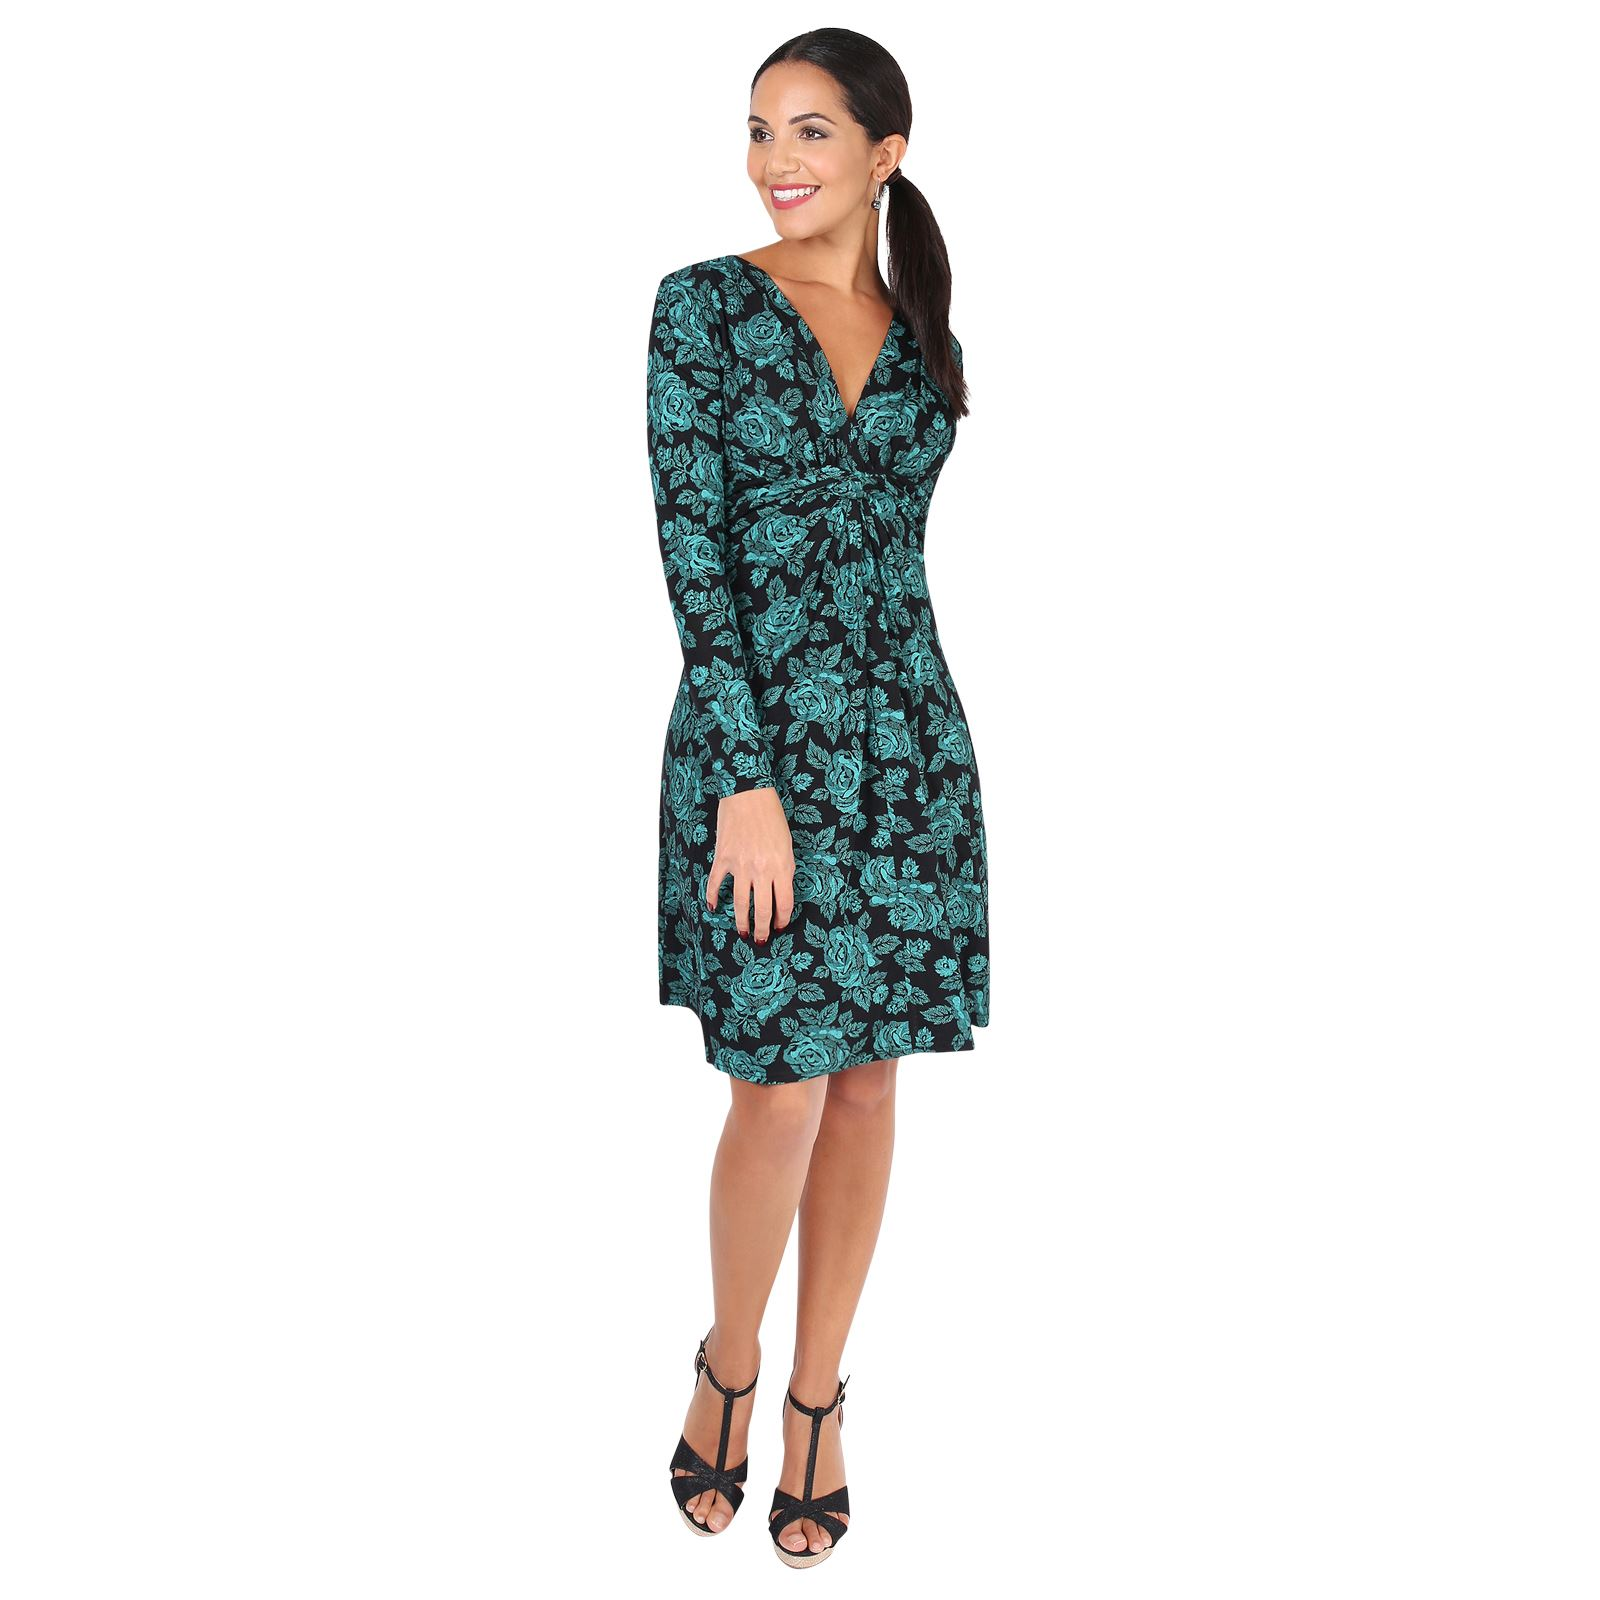 Damen Kleid Langarm Figurbetonend Minikleid Abendkleid Partykleid ...